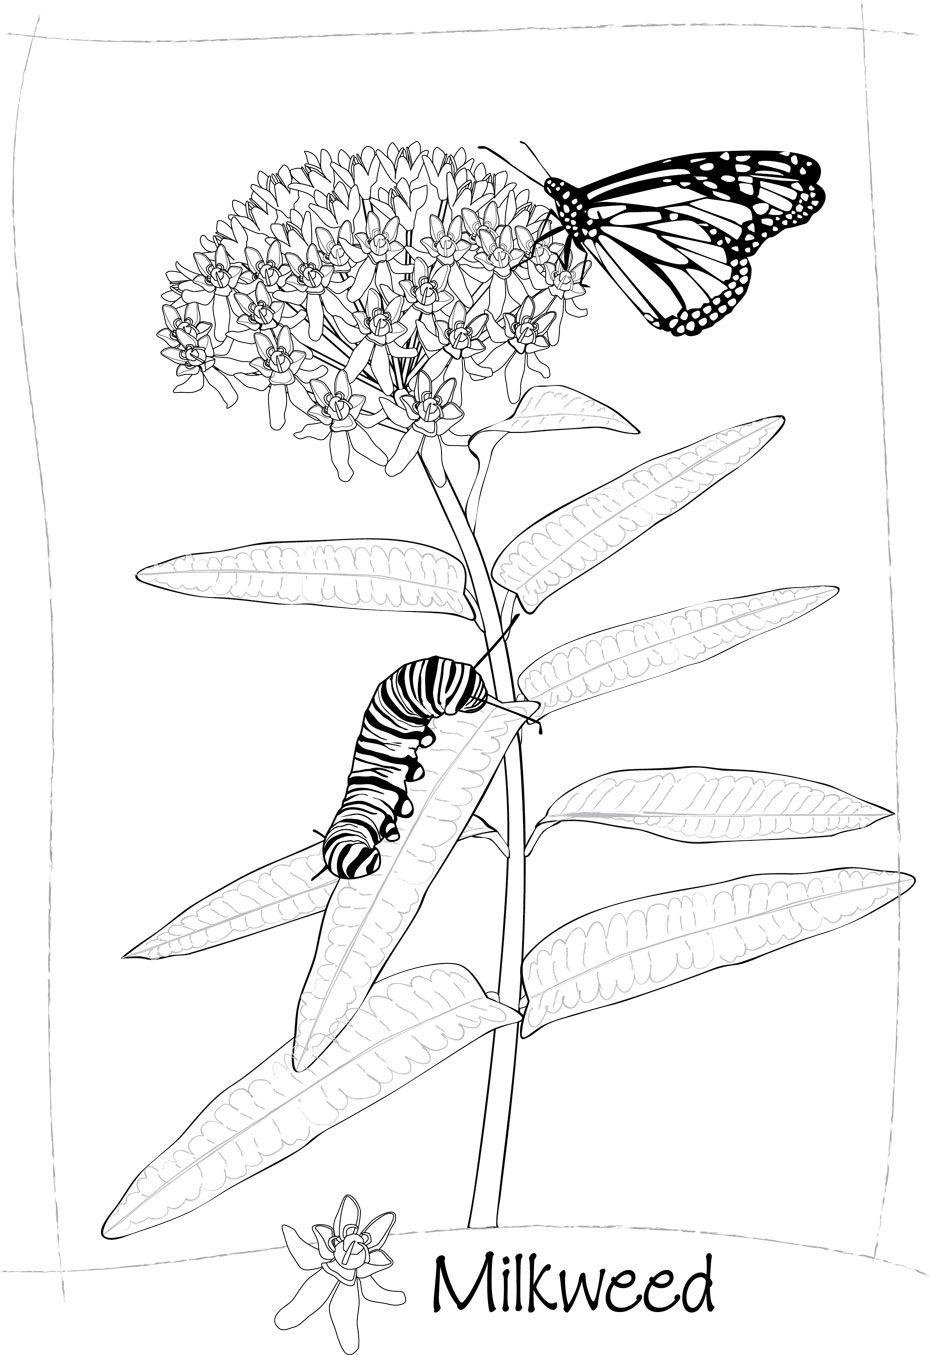 Milkweed art linda cook plant art 2013 meadow coloring book